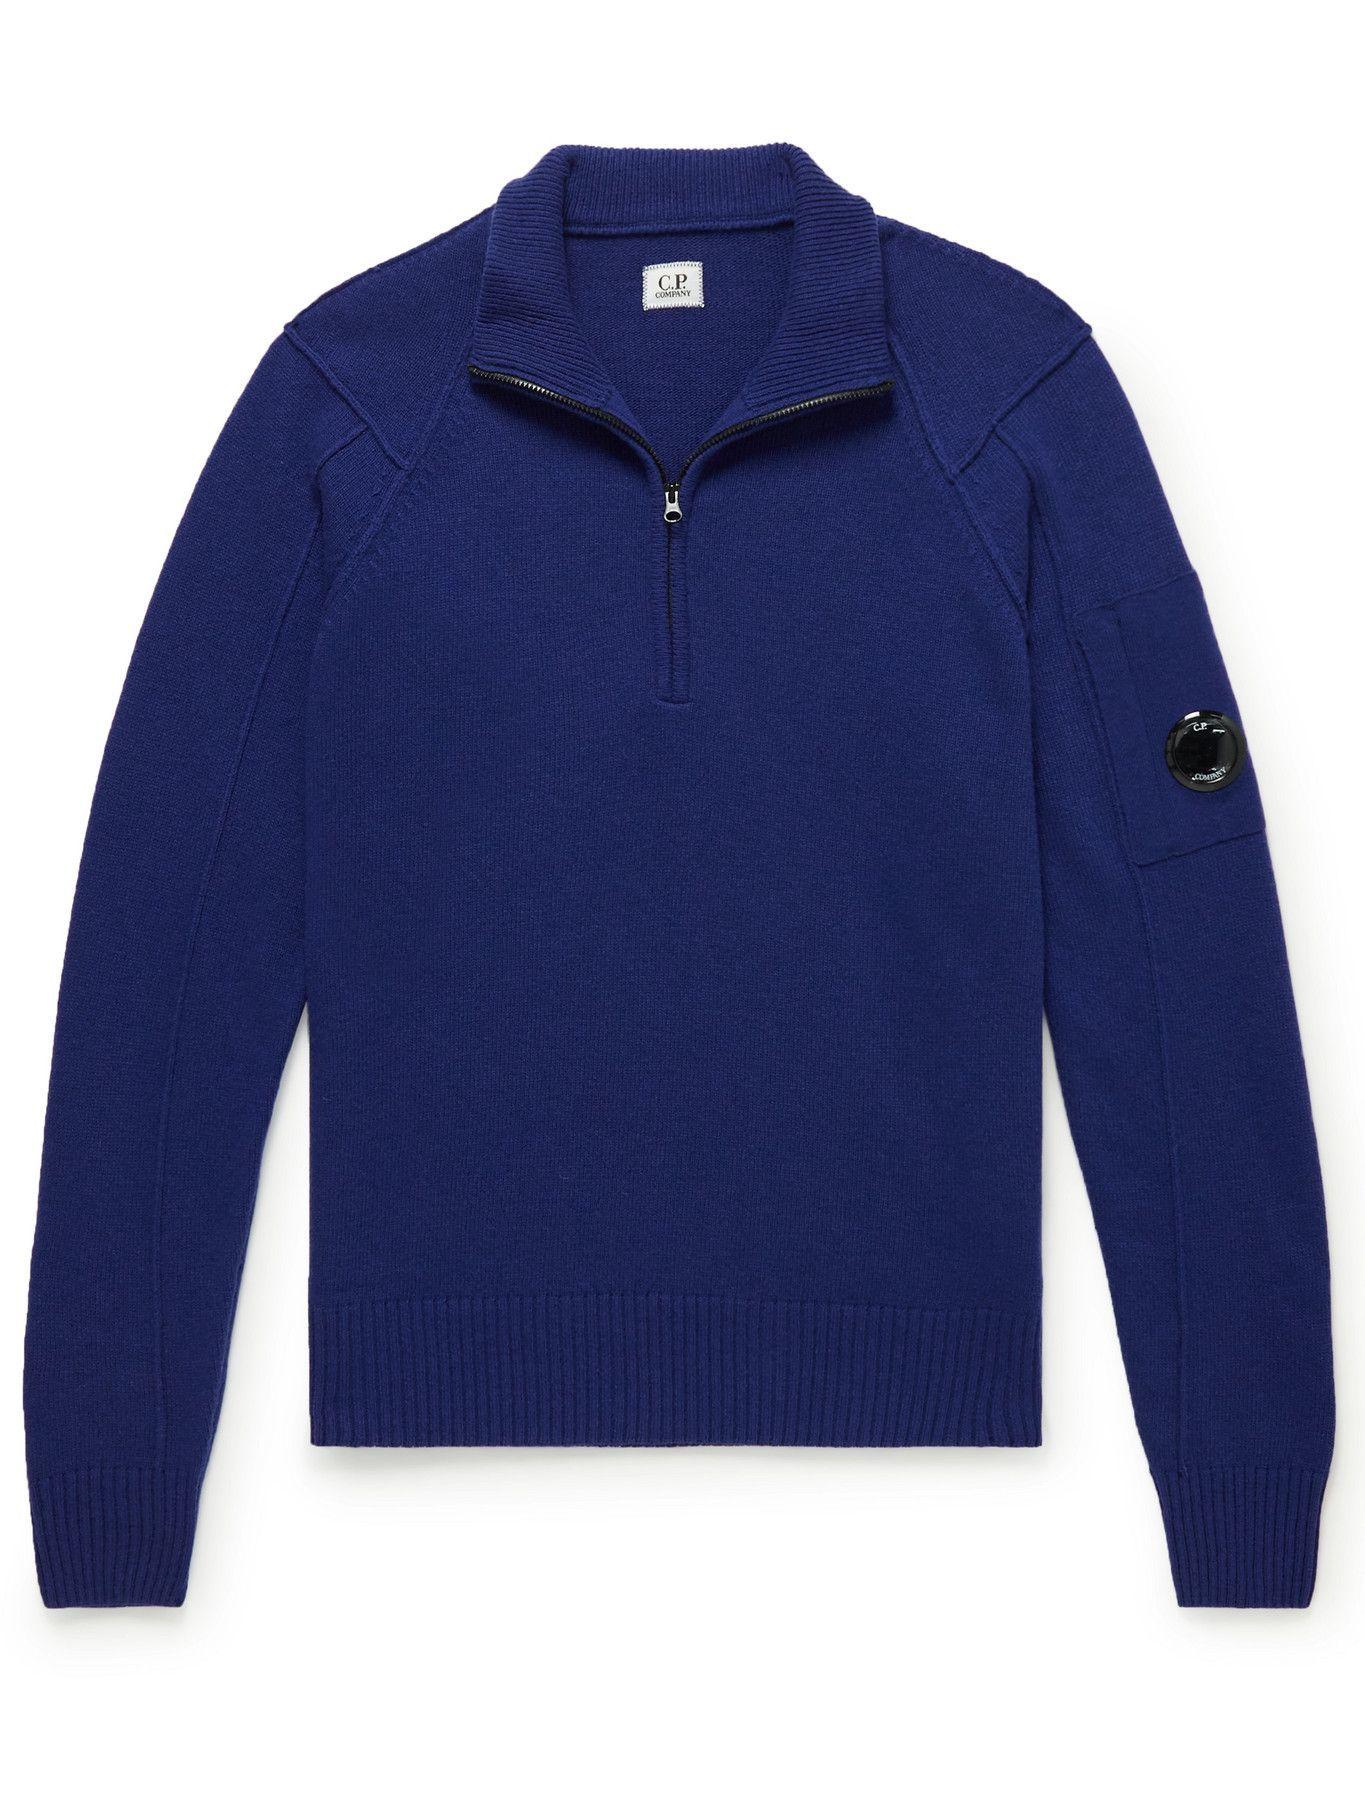 Photo: C.P. Company - Wool-Blend Half-Zip Sweater - Blue